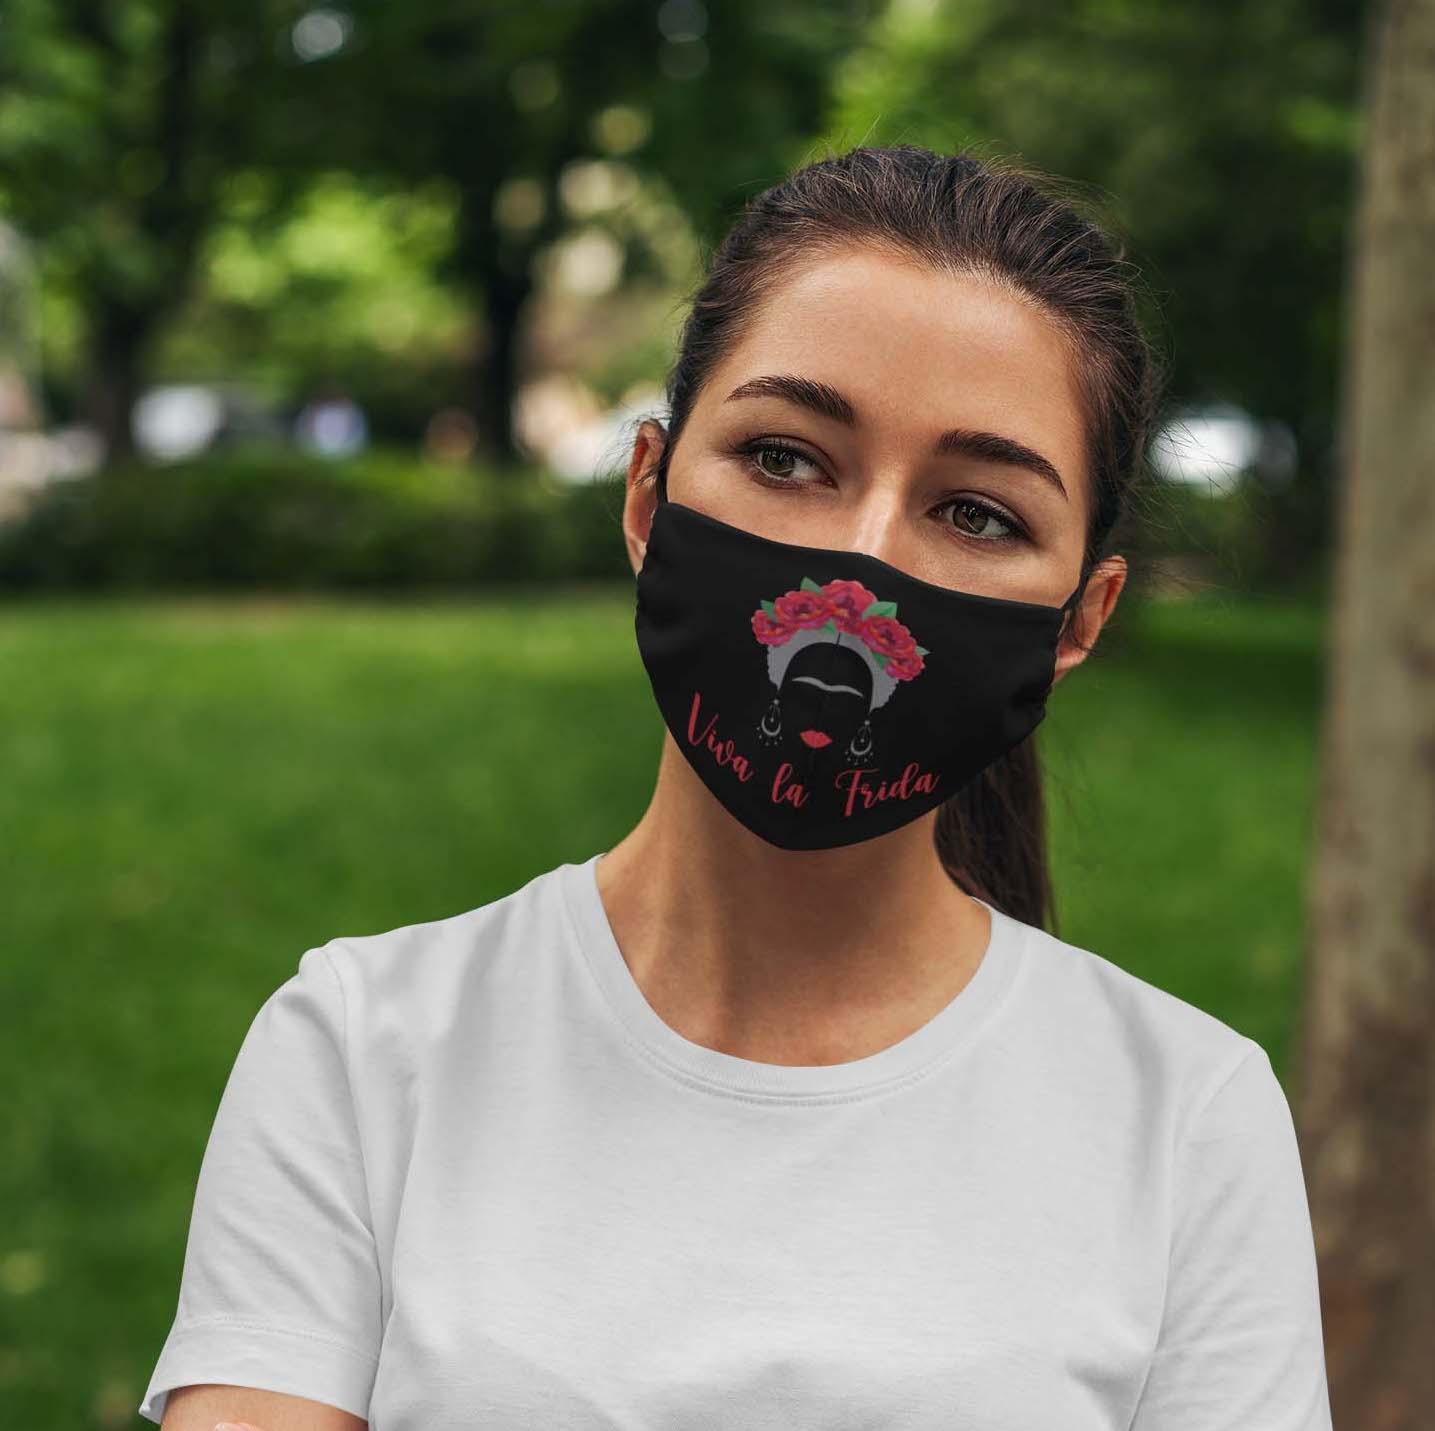 Viva la frida kahlo feminist anti pollution face mask 1